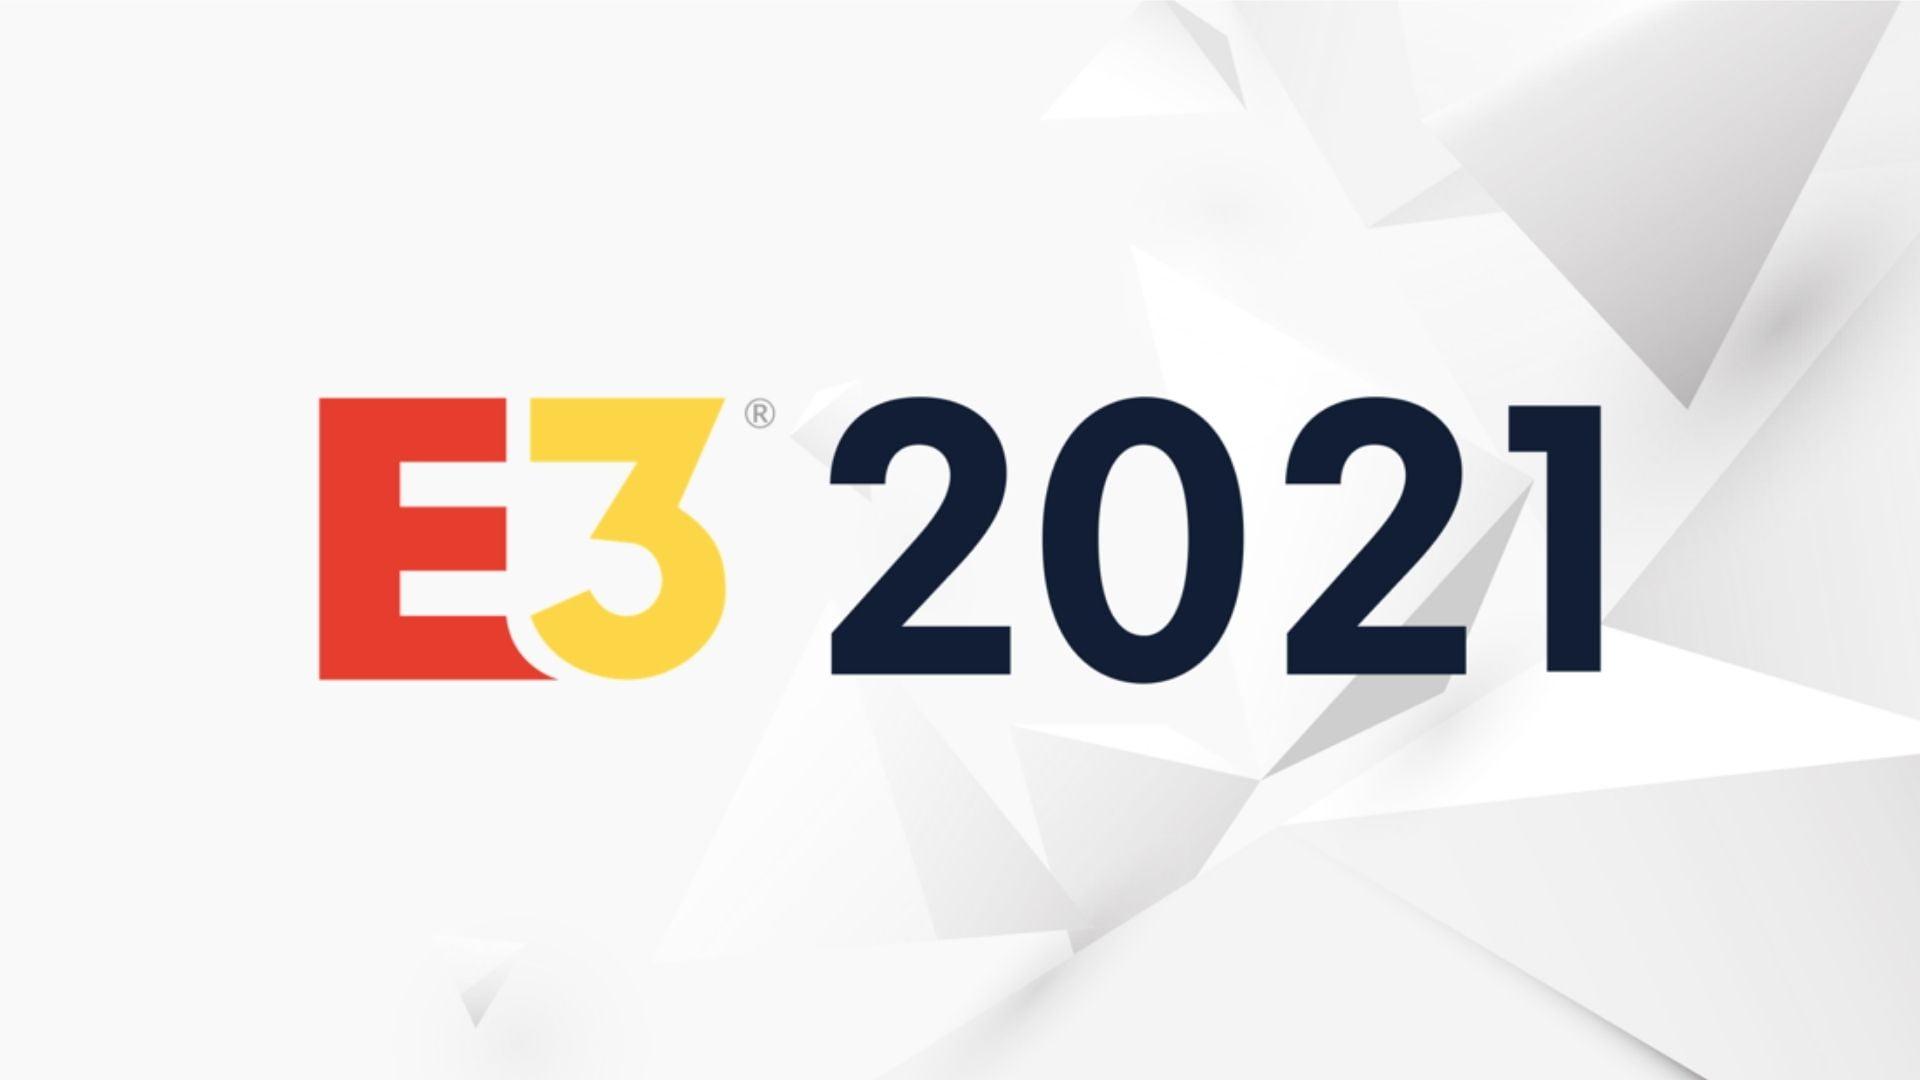 E3 2021: Koch Media announces a large showcase event